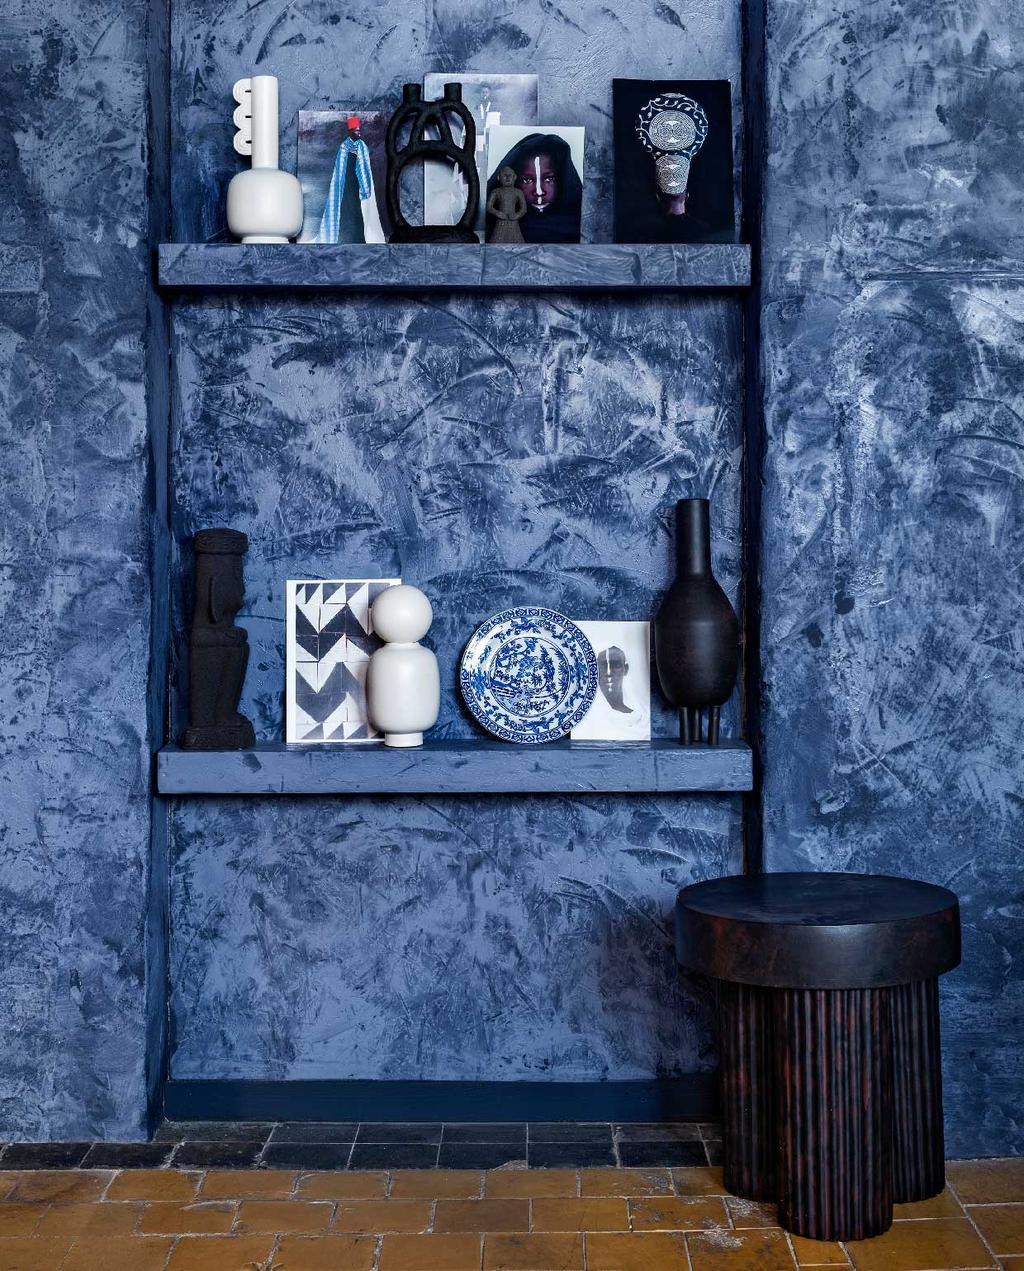 vtwonen 10-2020 | trendhuis culture club marianne inbouwkast blauwe kalkverf